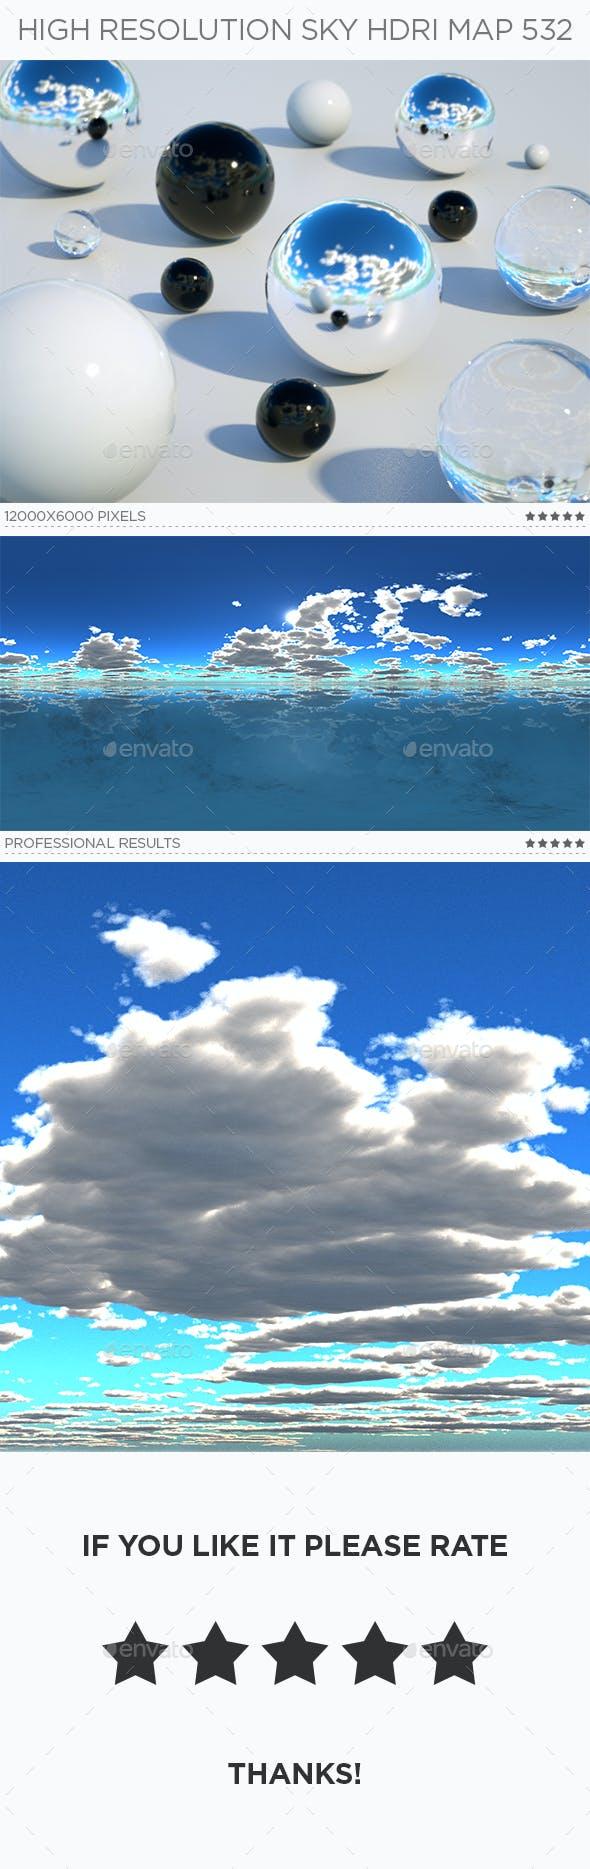 High Resolution Sky HDRi Map 532 - 3DOcean Item for Sale